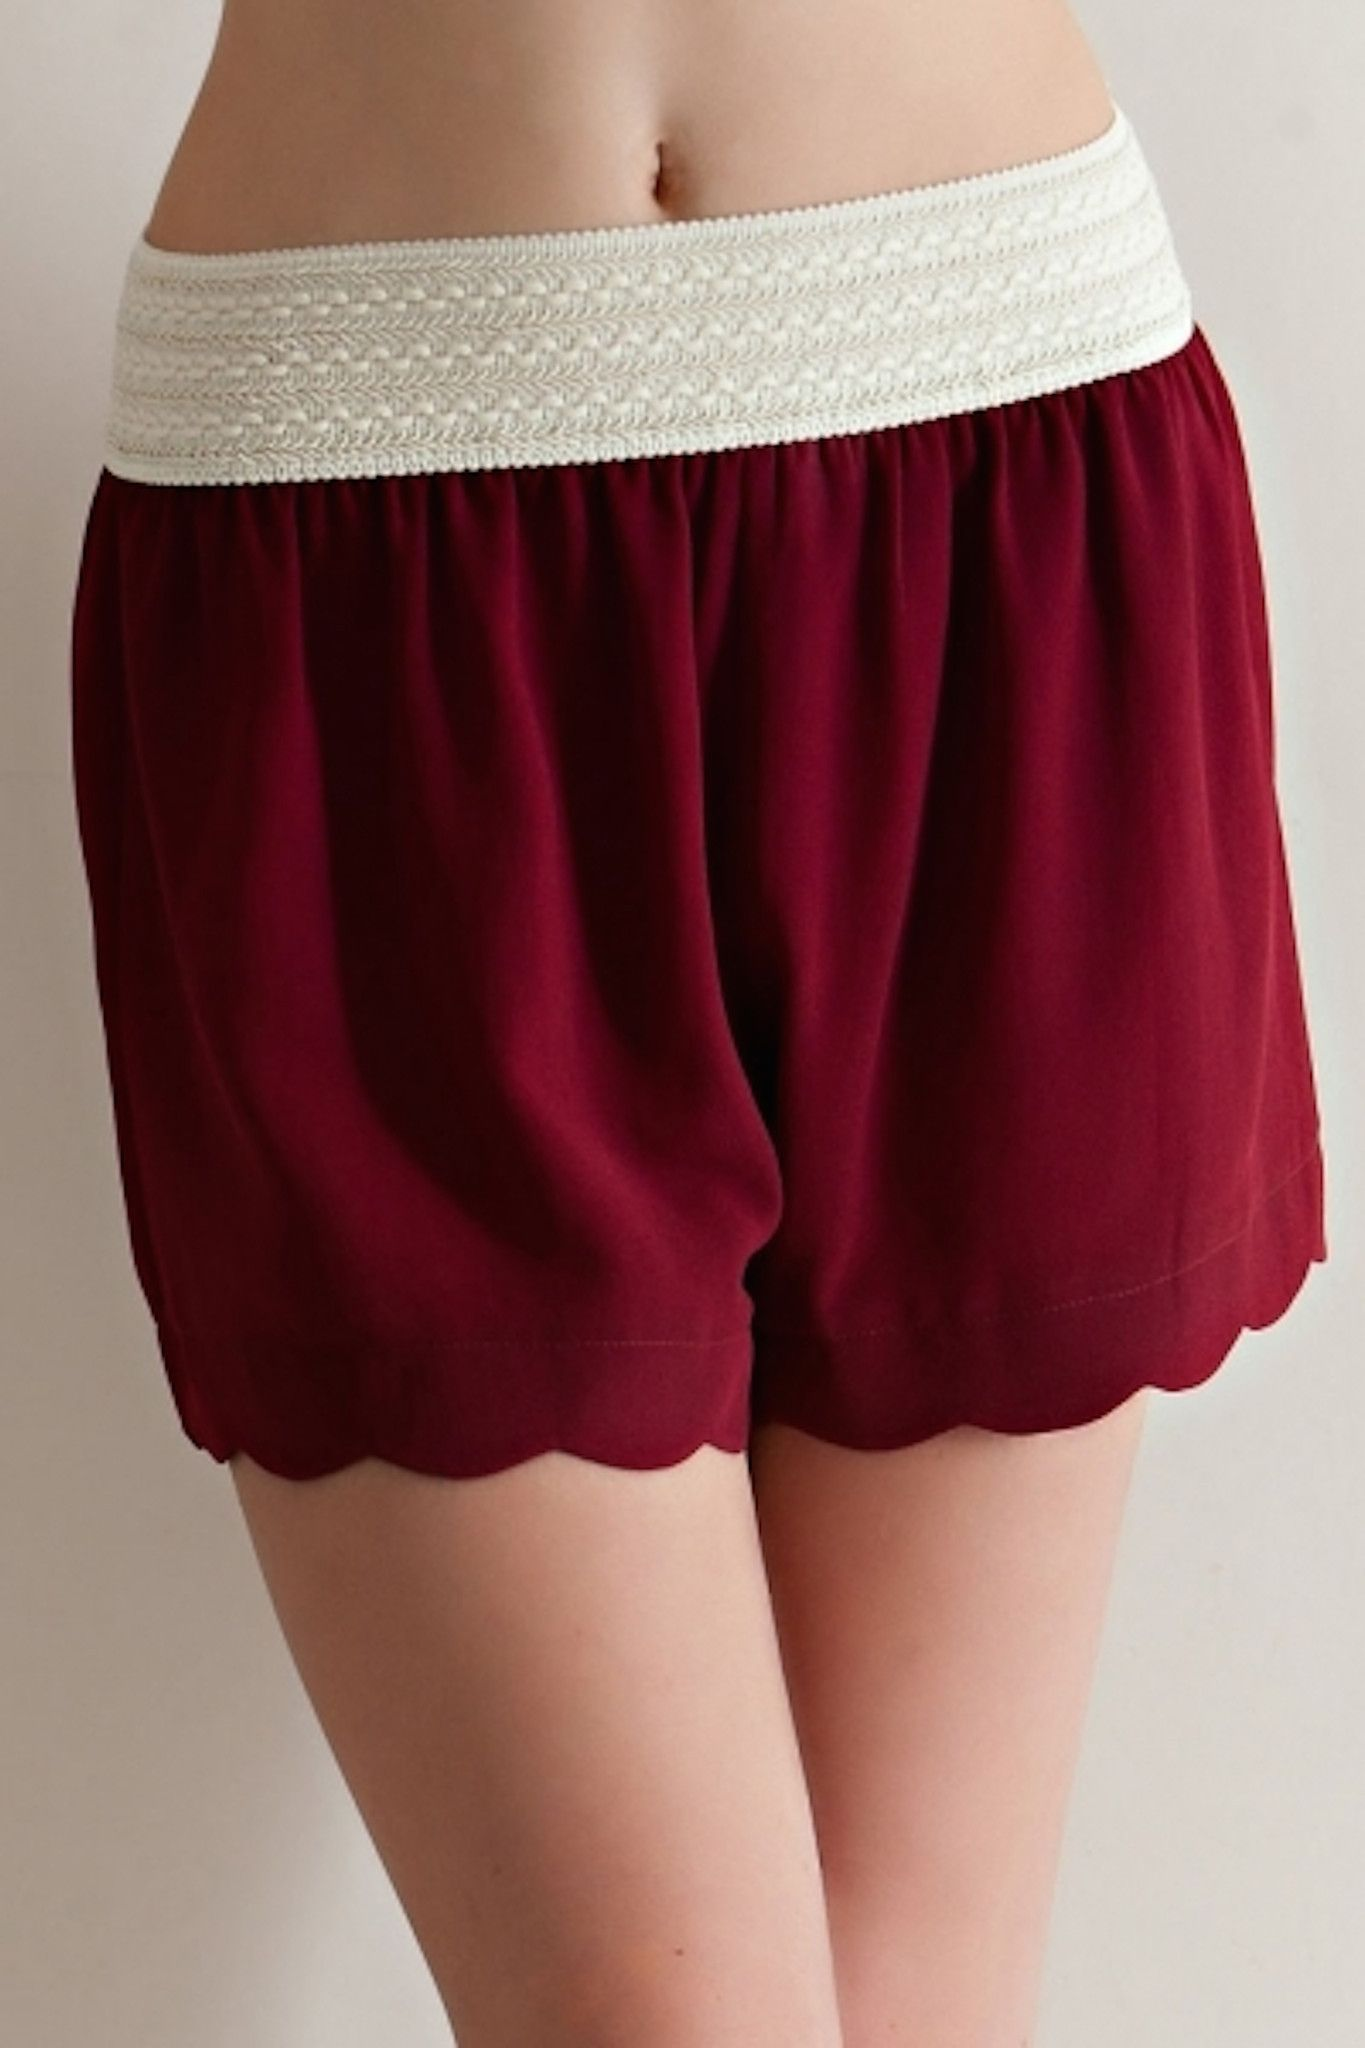 Entro Women's Flowy Chiffon Elastic Lace Shorts